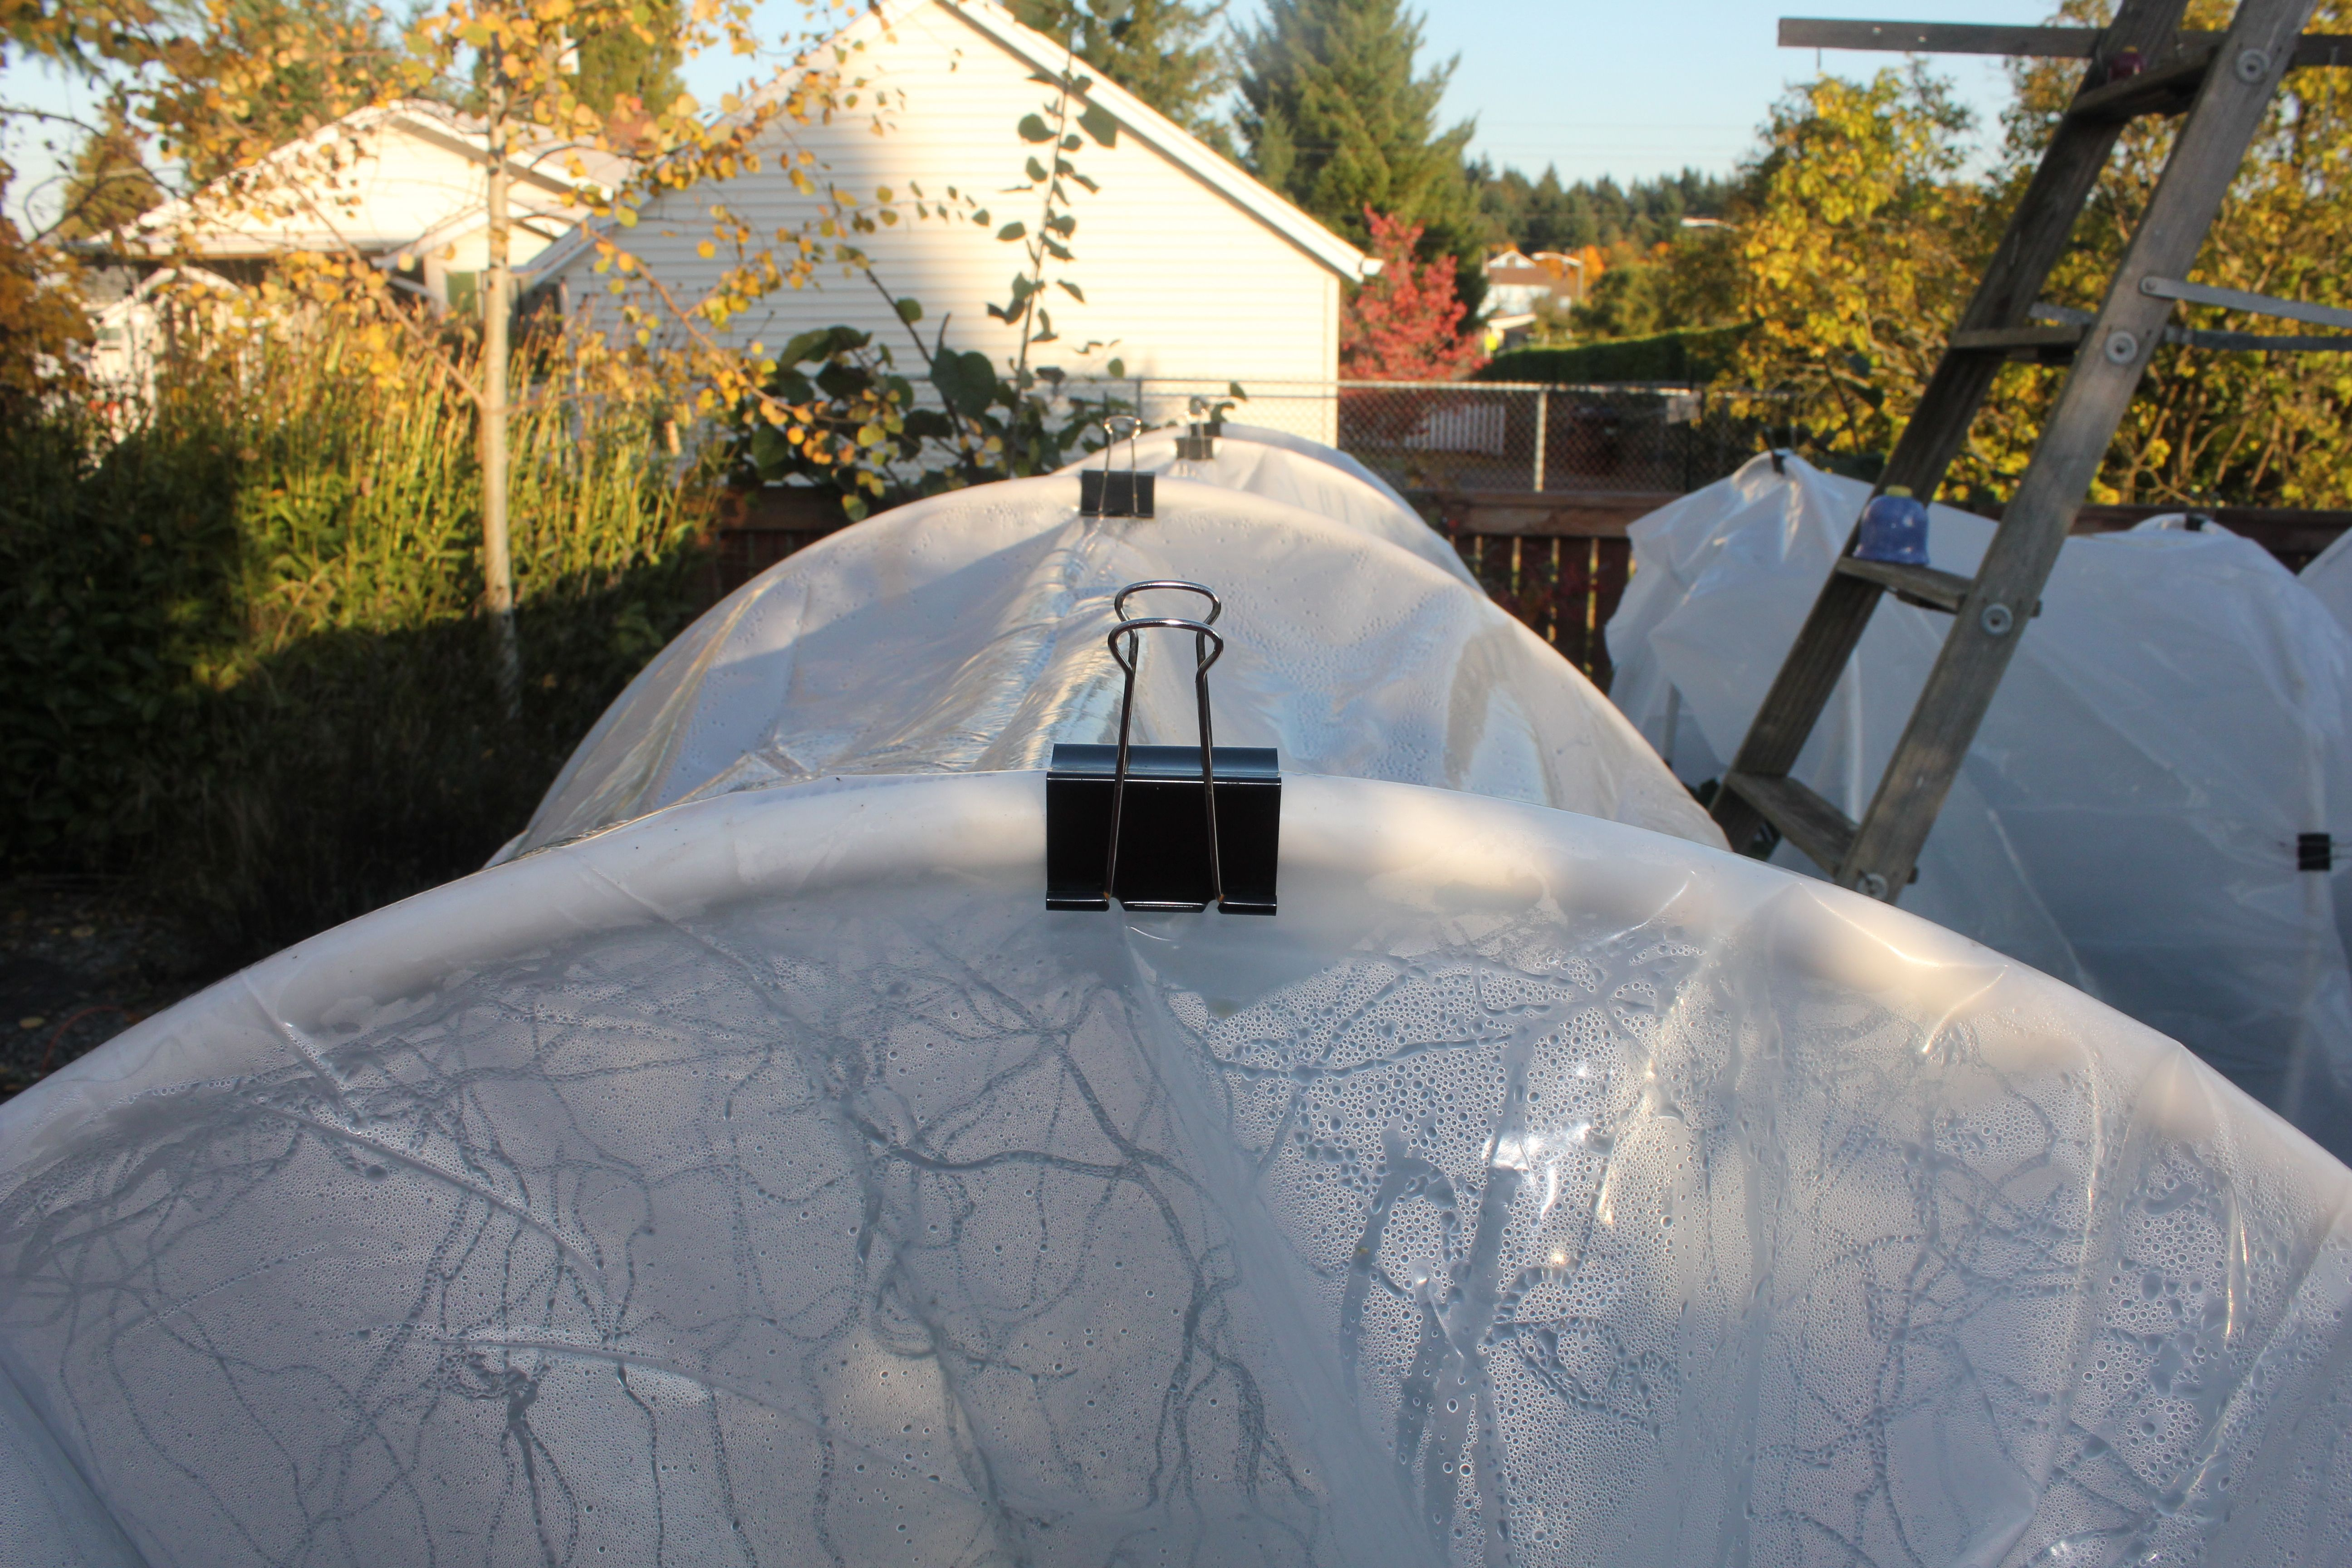 PVC Hoop House Cold frame, Greenhouse plans, House seasons